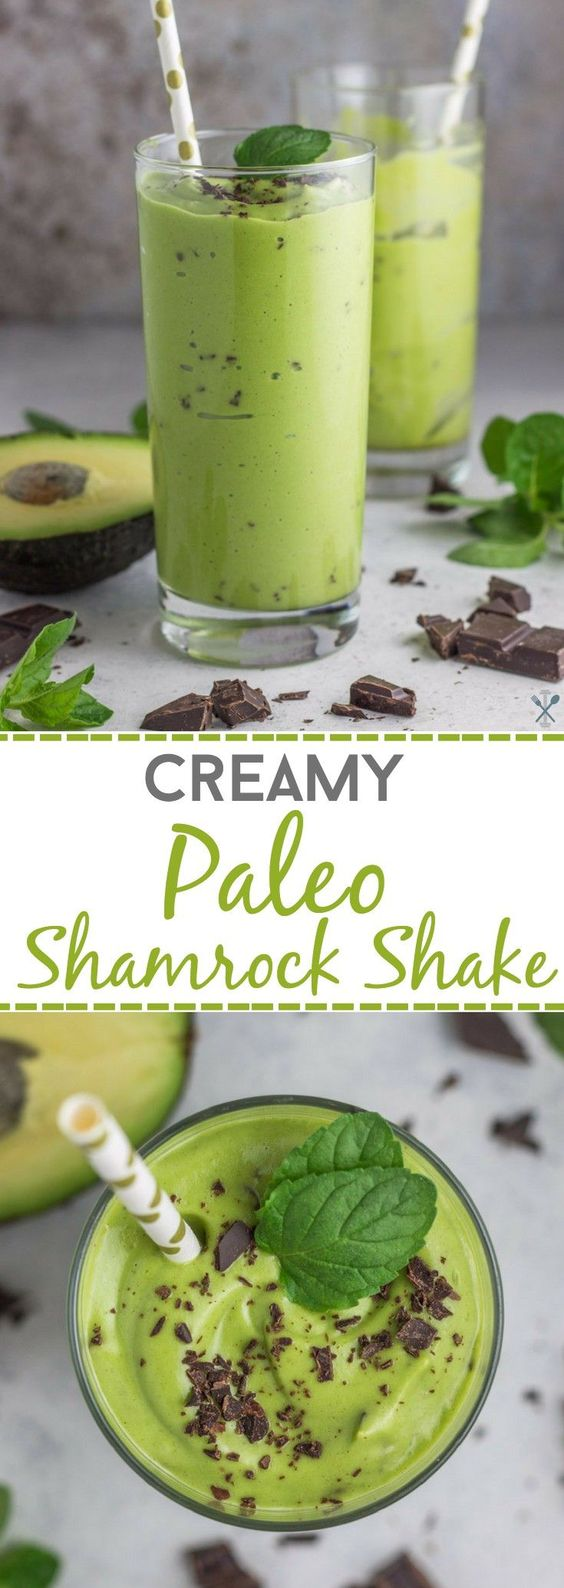 Creamy Paleo Shamrock Shake